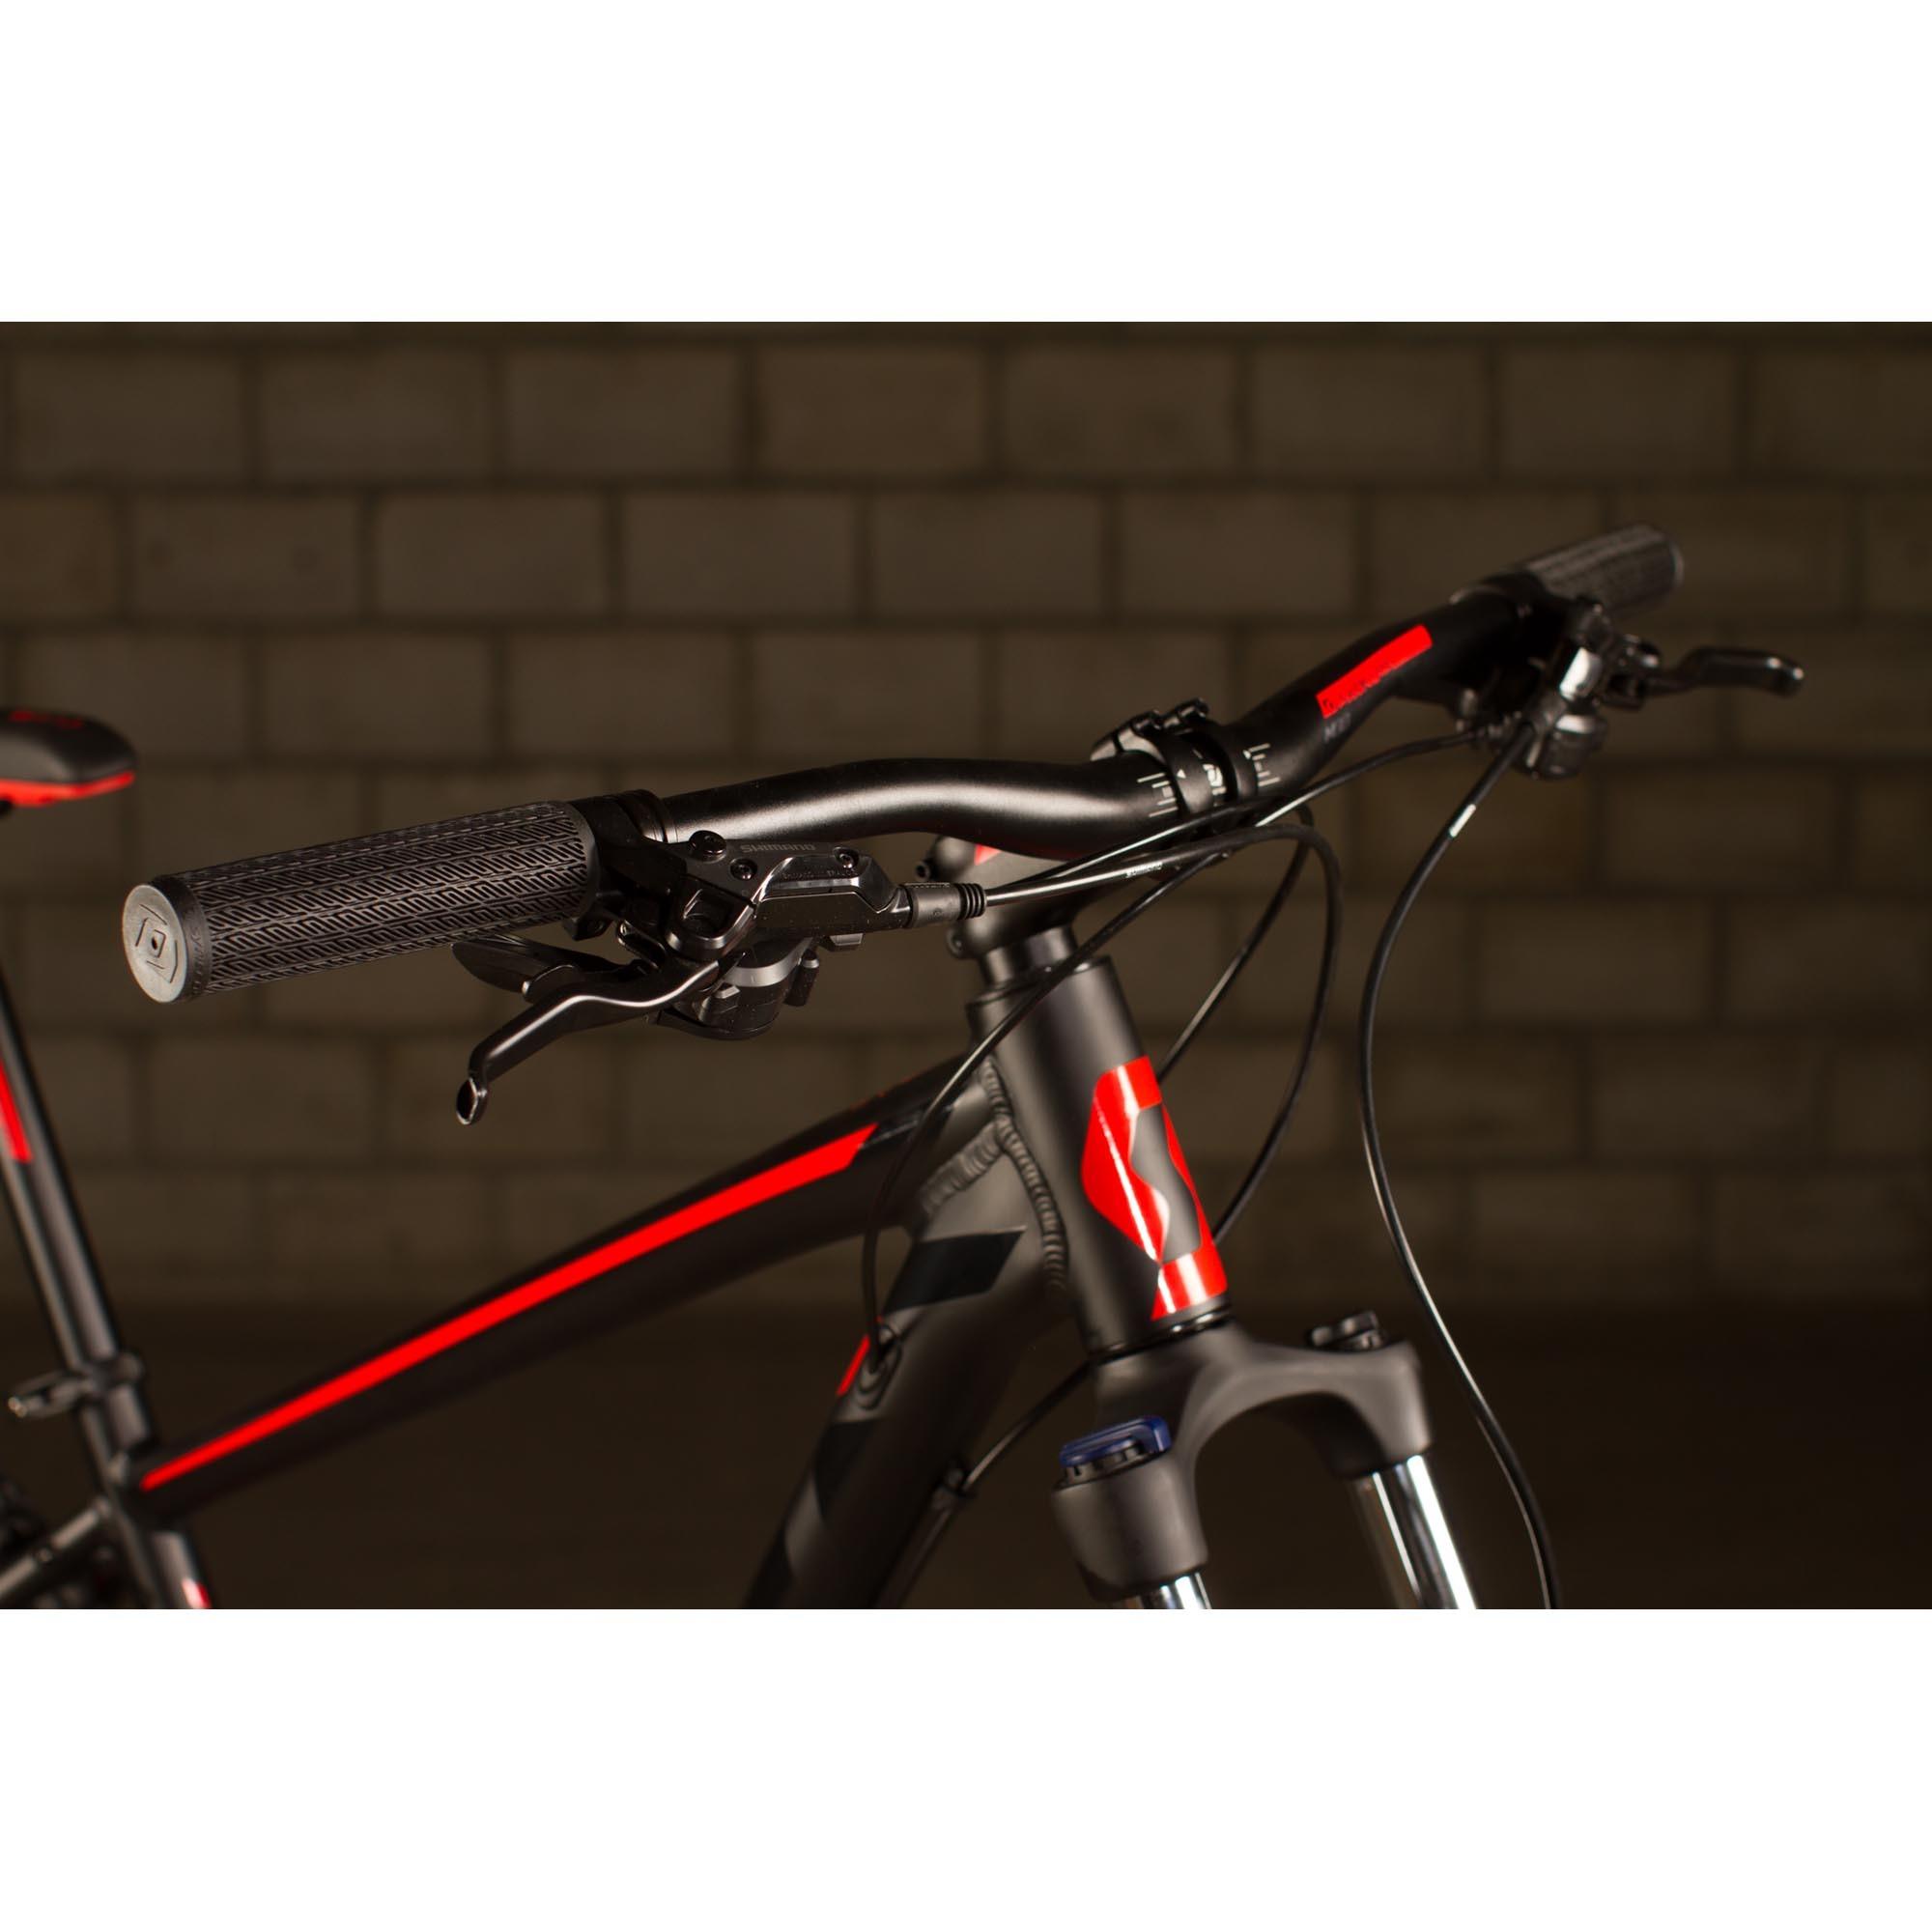 Scott Scale Bikes For Sale Scott Scale 920 Hardtail